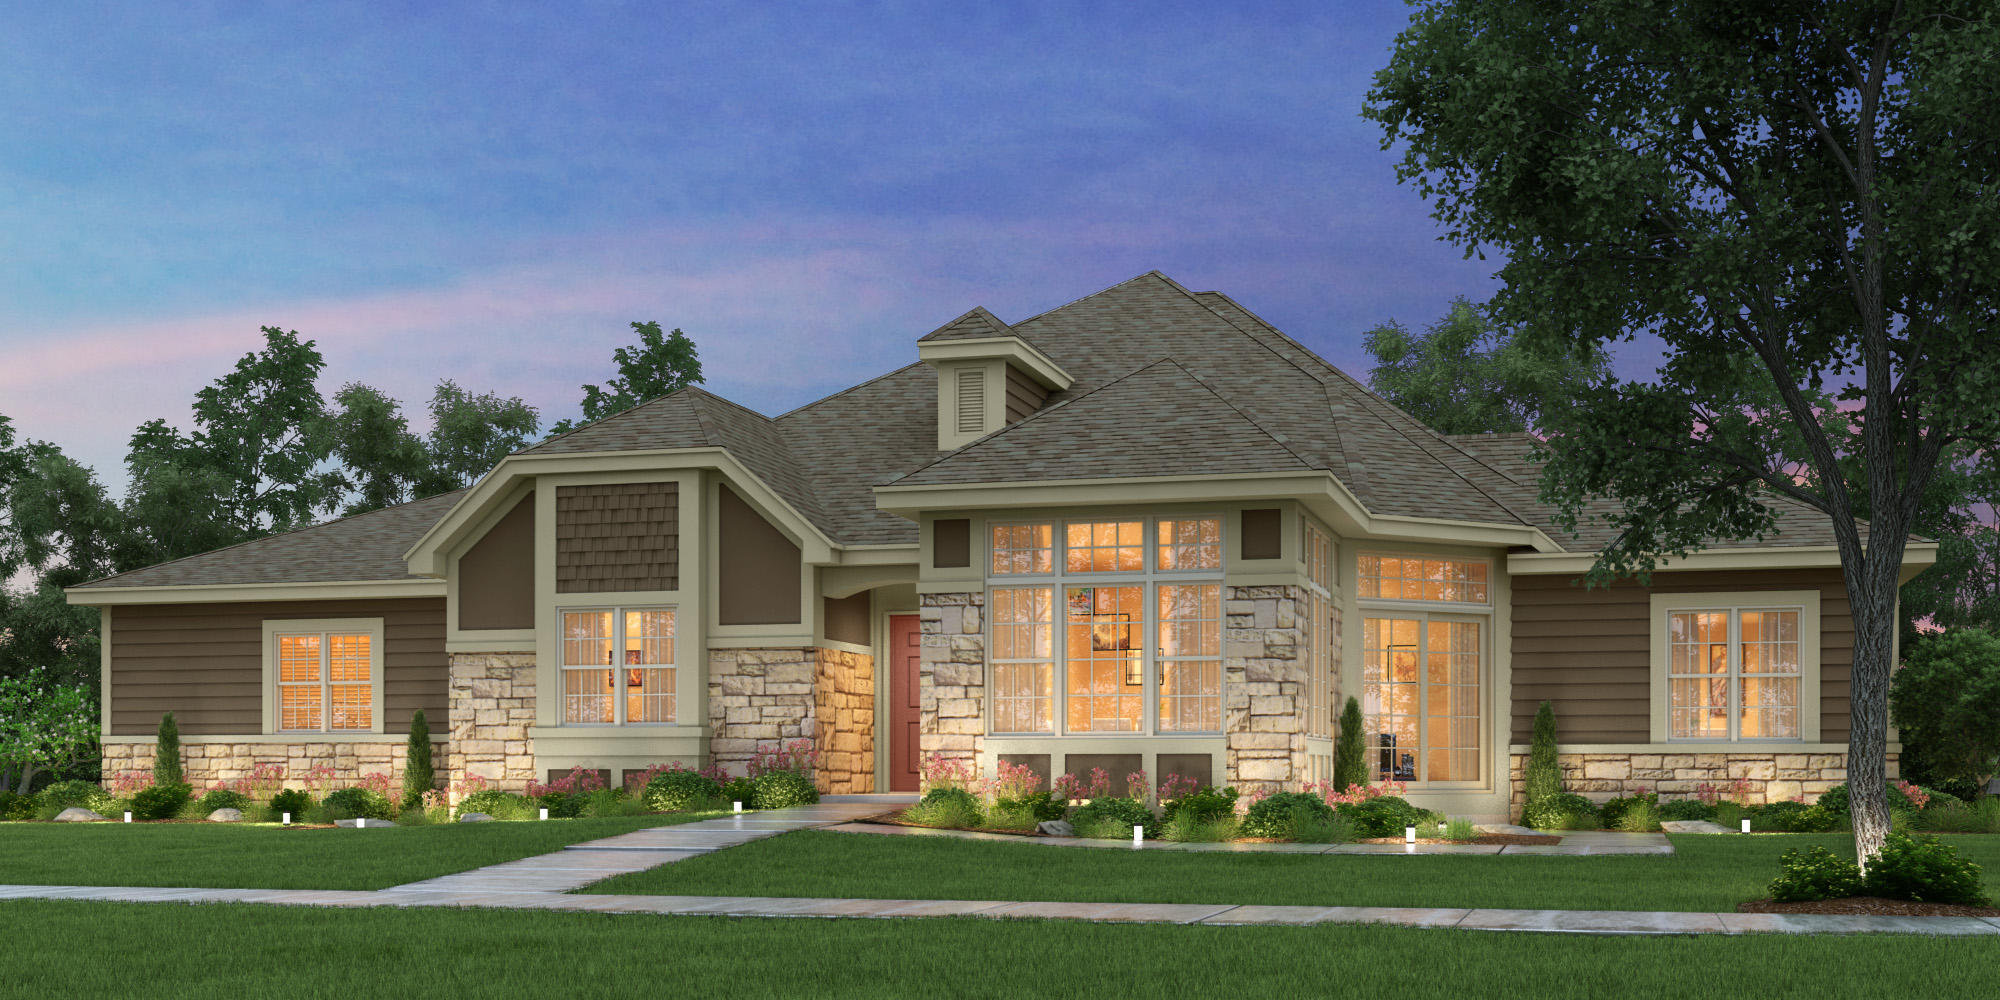 4369 Creekside Pass, Brookfield, Wisconsin 53005, 2 Bedrooms Bedrooms, 7 Rooms Rooms,2 BathroomsBathrooms,Condominiums,For Sale,Creekside Pass,1,1722628